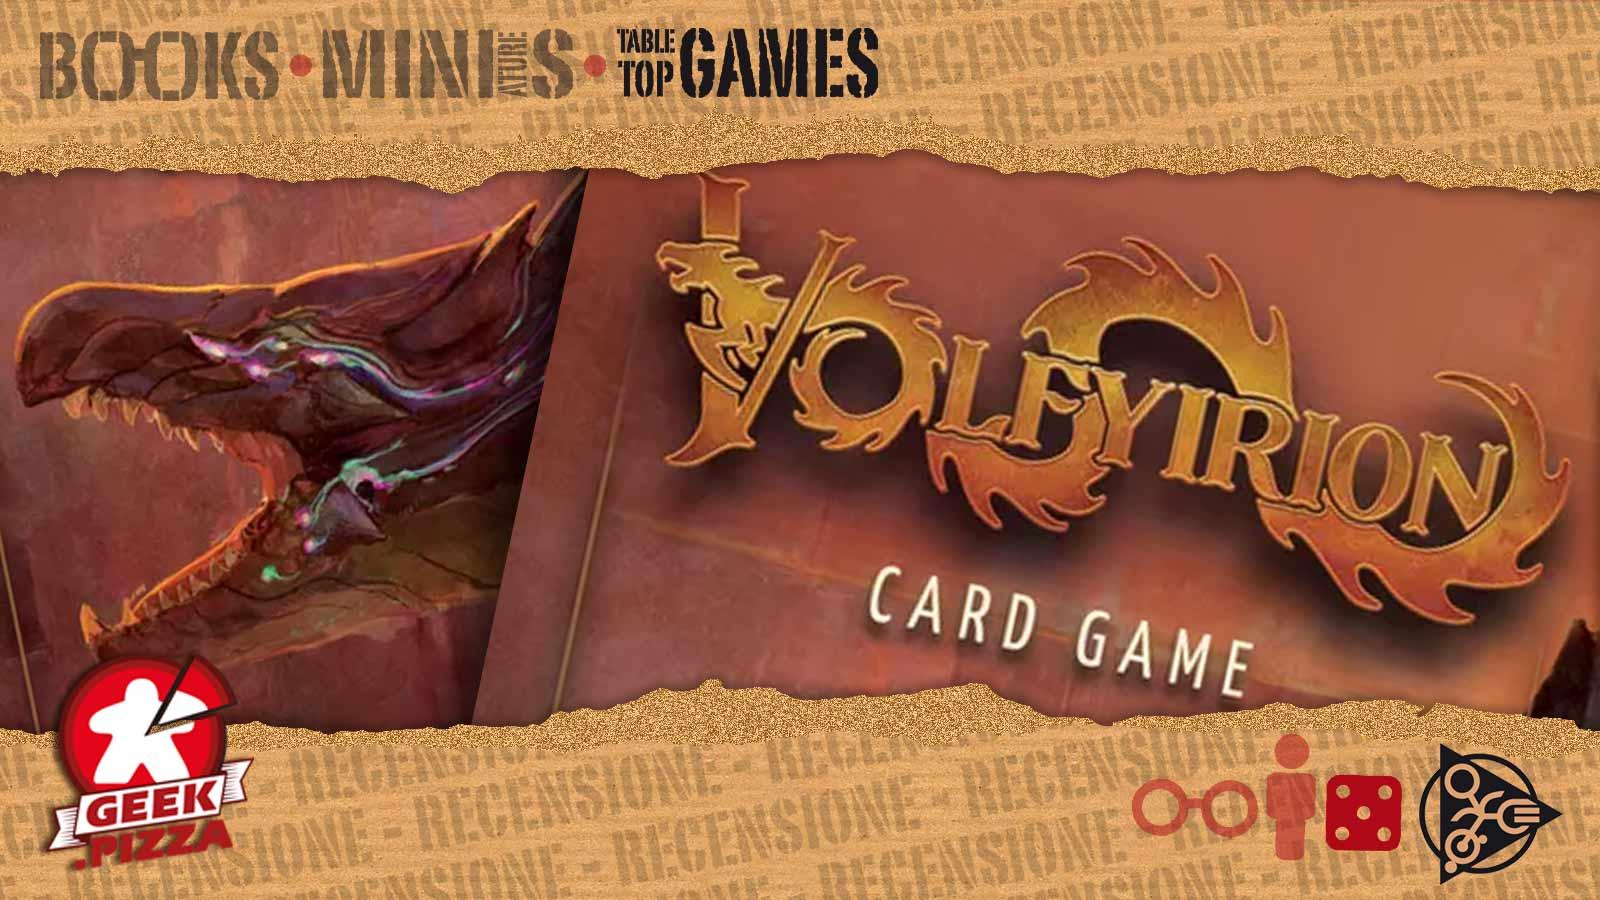 TTGames: Volfyirion